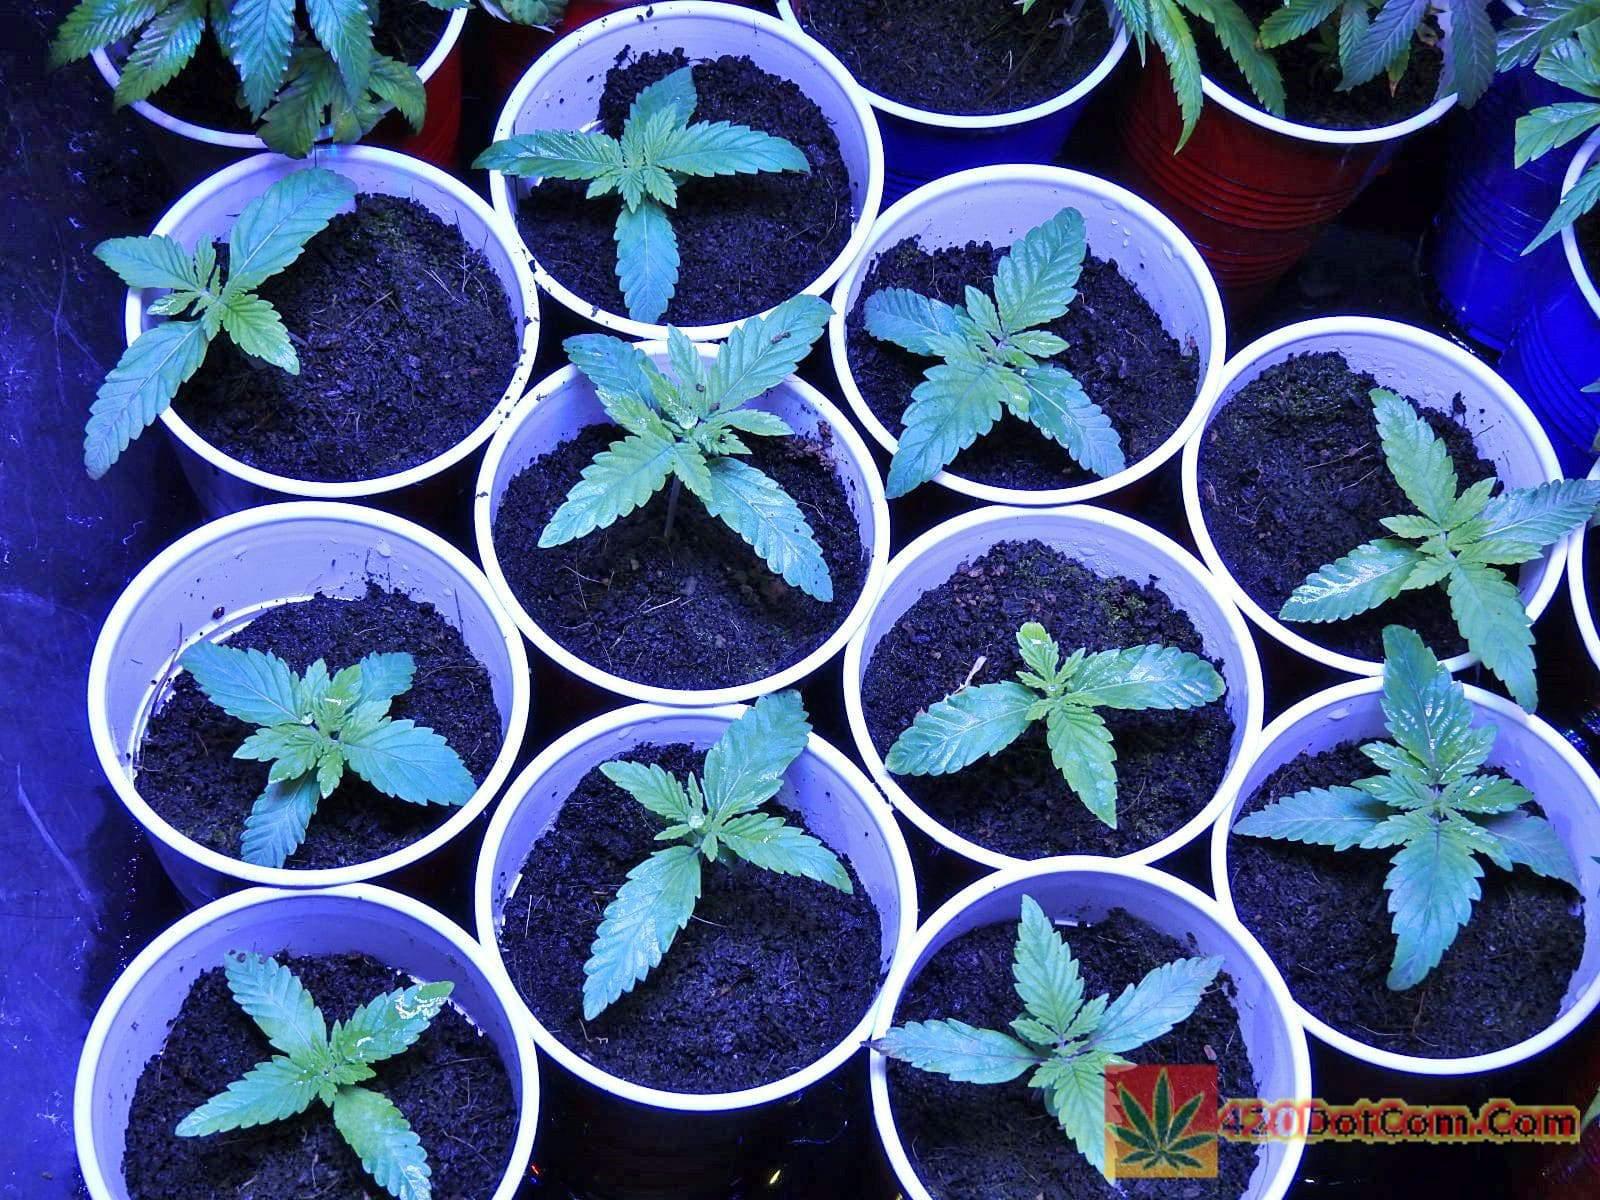 Gorilla Glue Seeds - Gorilla Bubble Grow Day 10